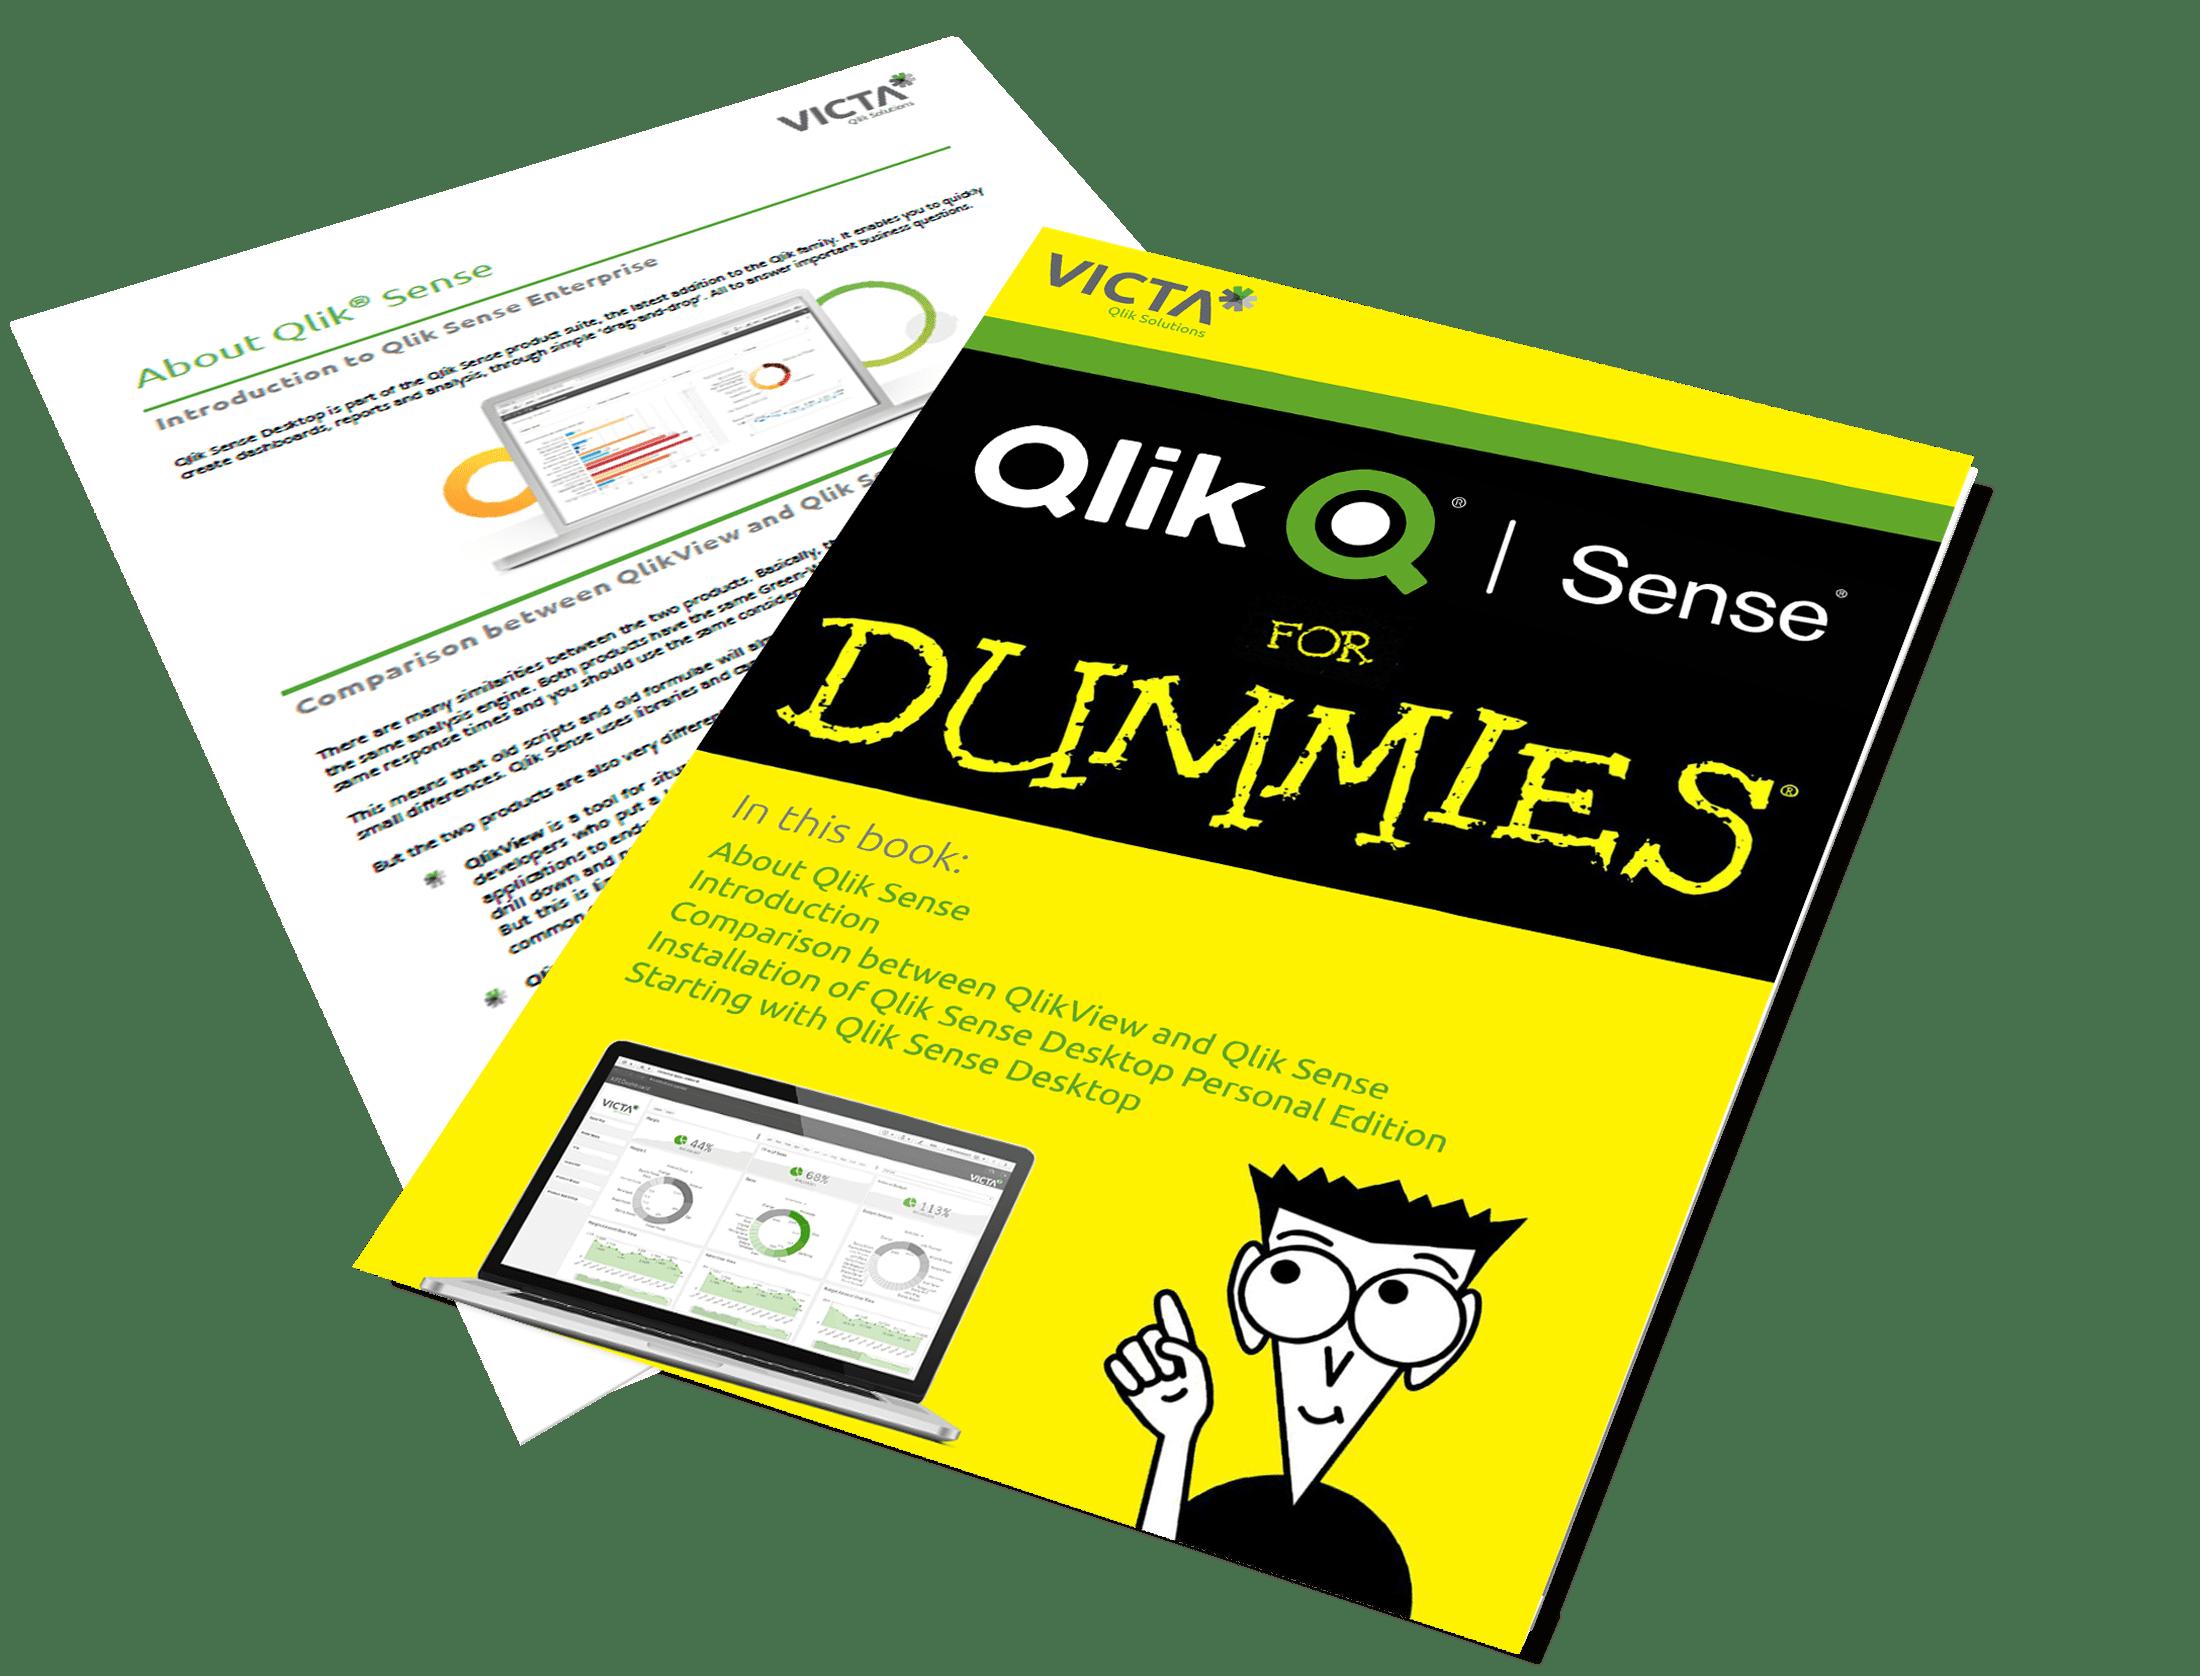 Qlik Sense for Dummies - Victa Business intelligence